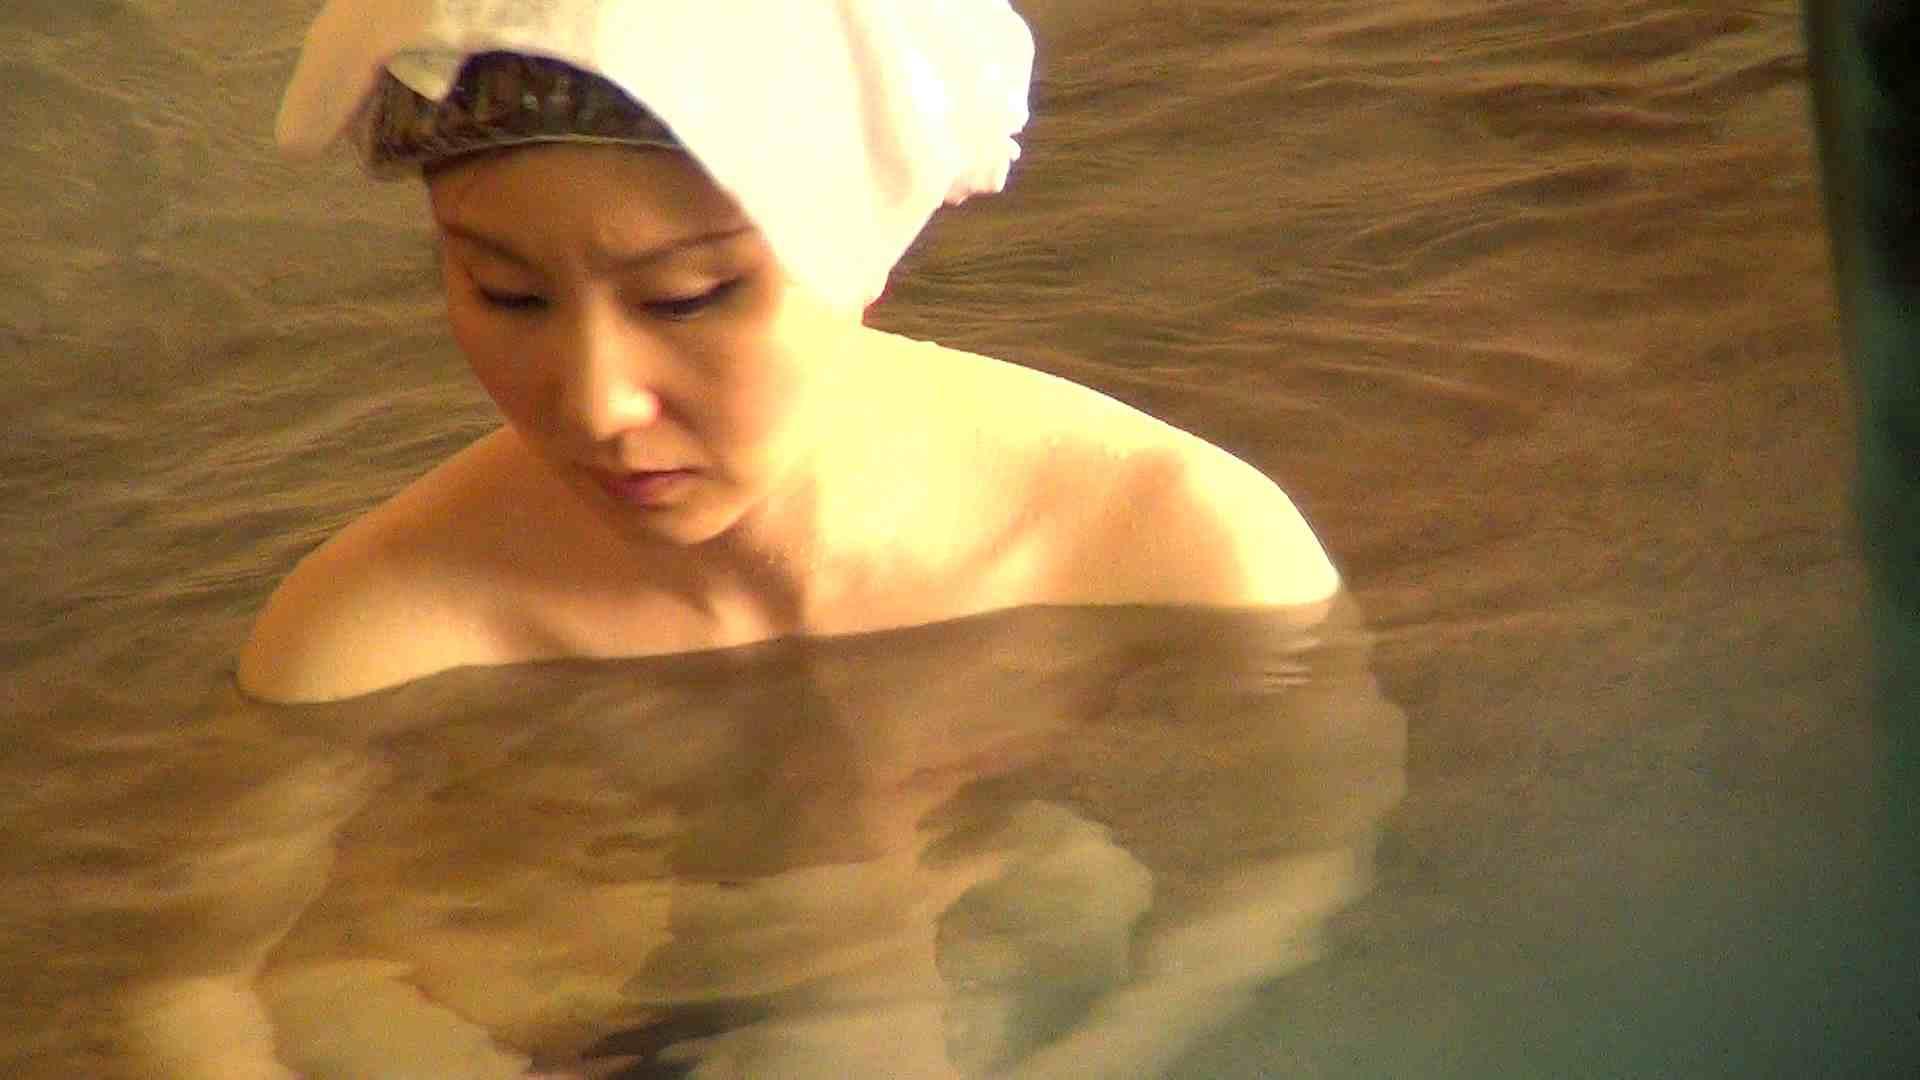 Aquaな露天風呂Vol.278 0 | 0  88連発 56